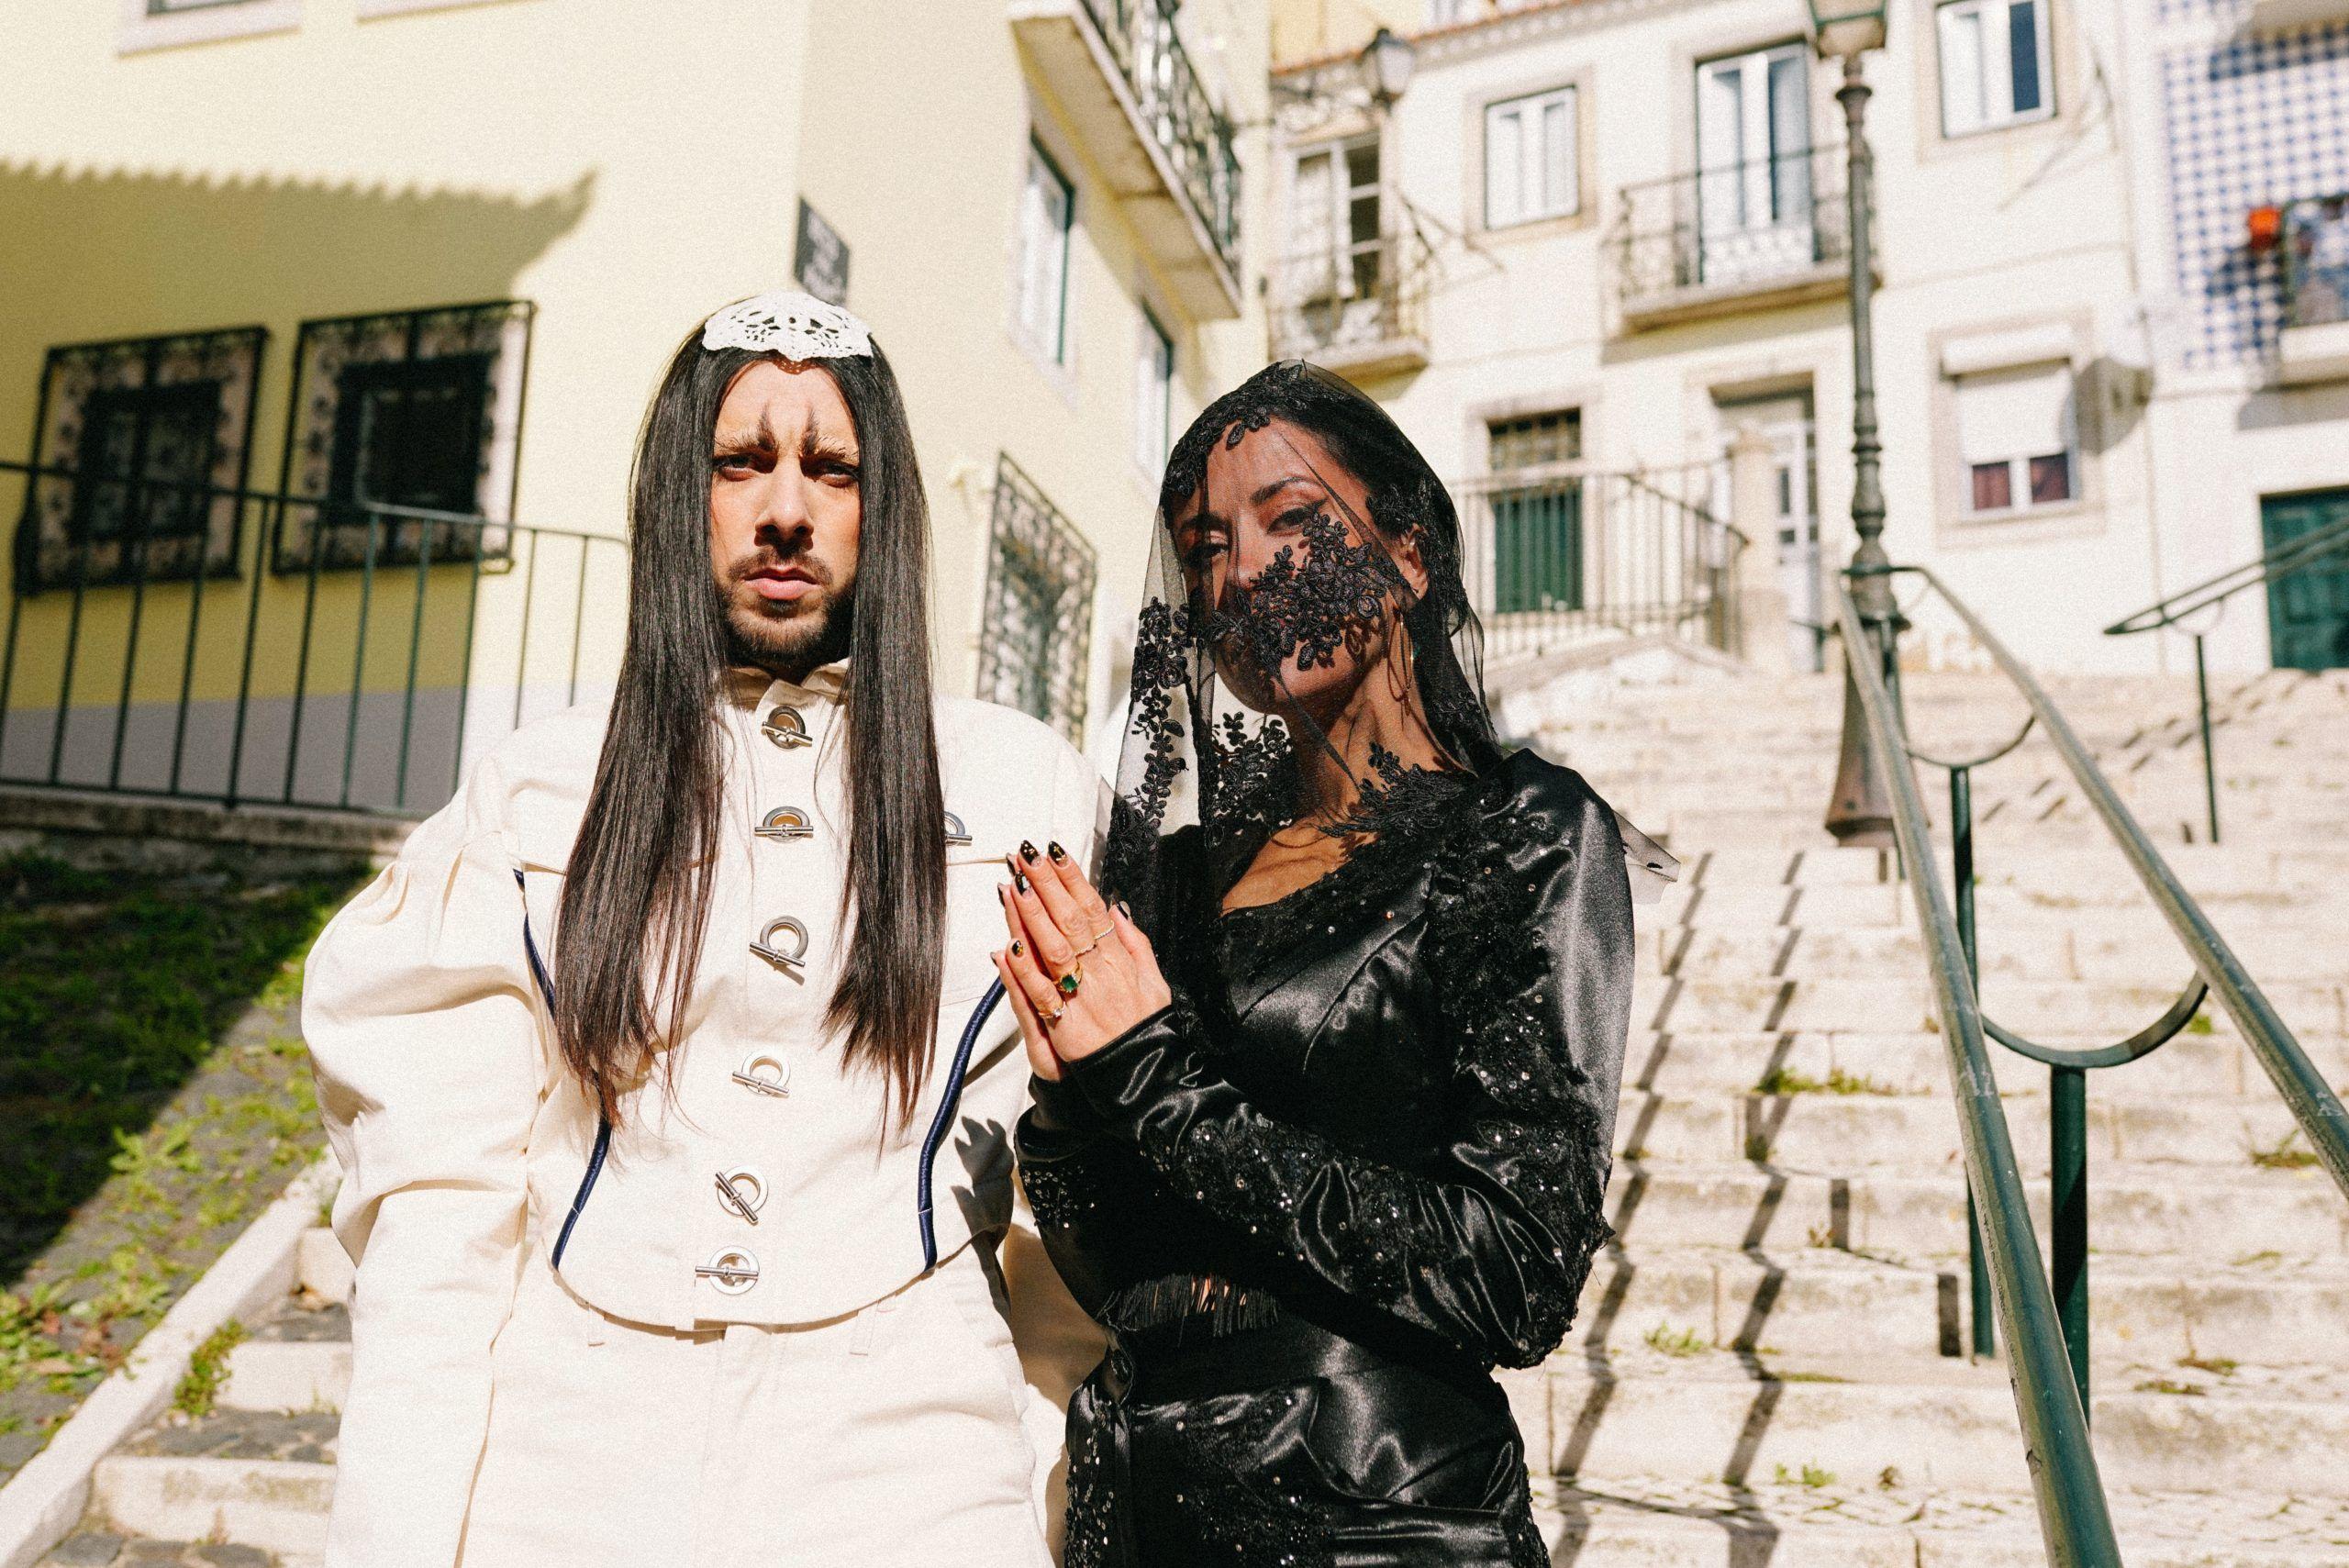 Ana Moura, Branko e Conan Osíris enterram o ano de 2020 num videoclipe